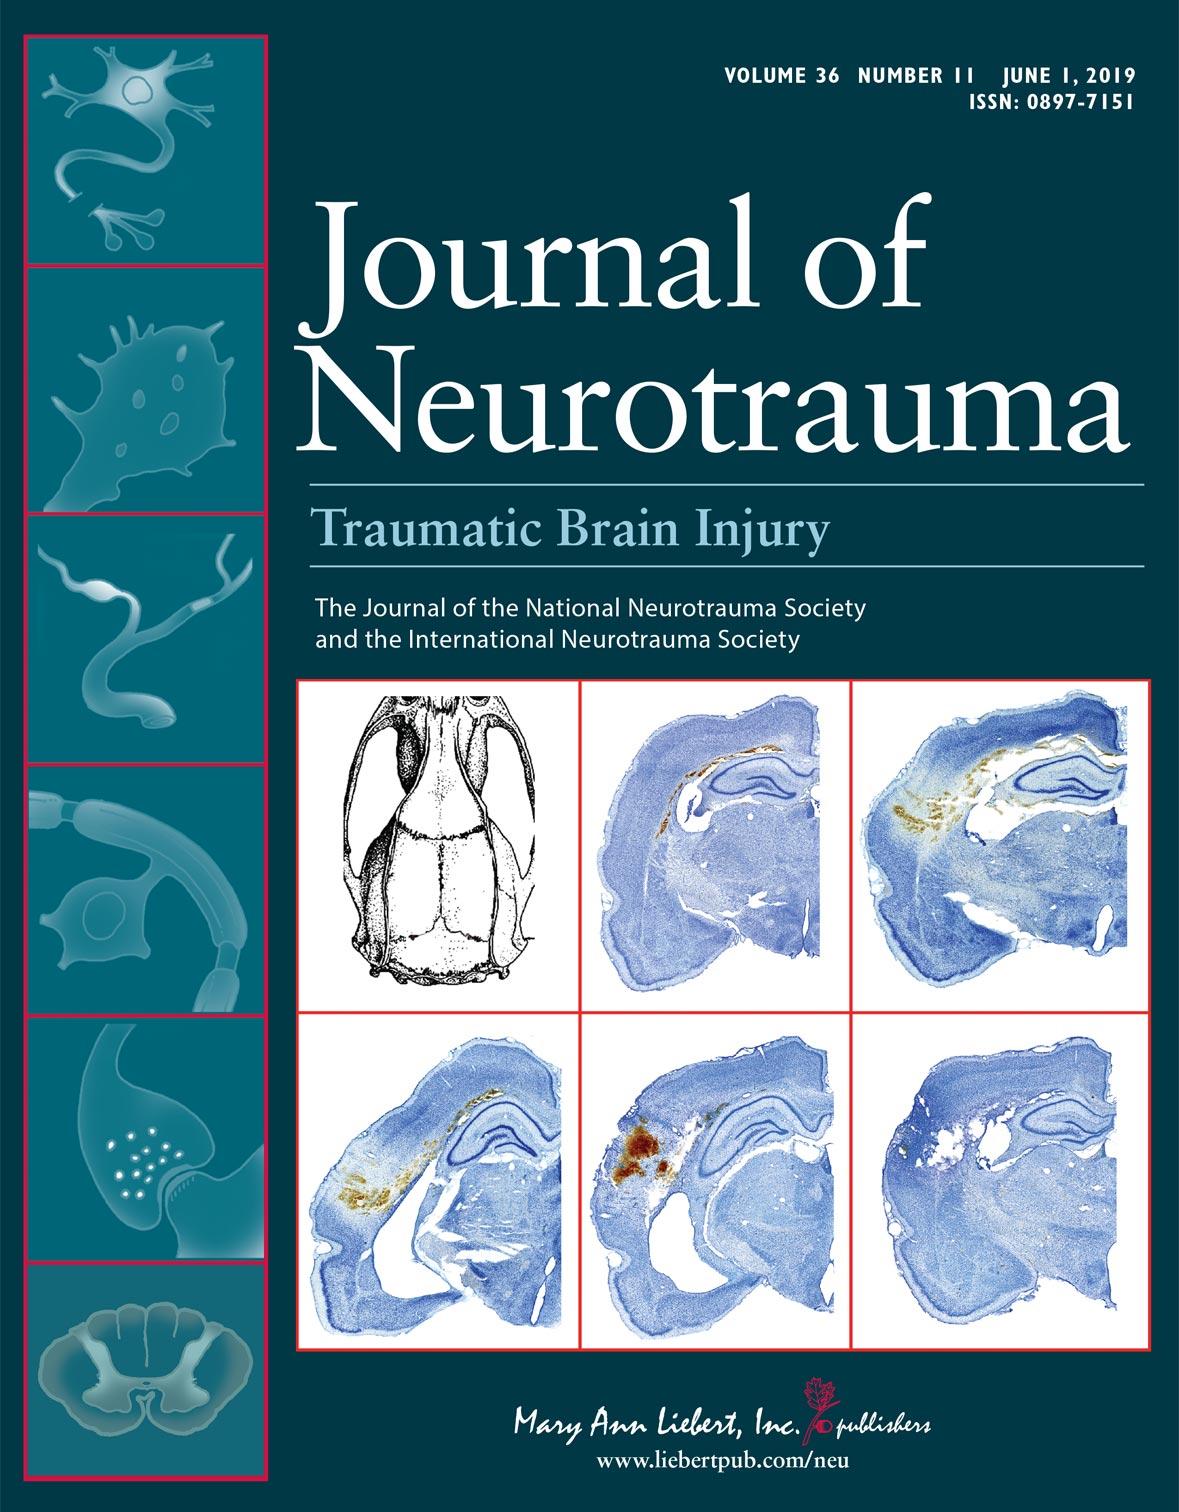 Geriatric Traumatic Brain Injury: Epidemiology, Outcomes